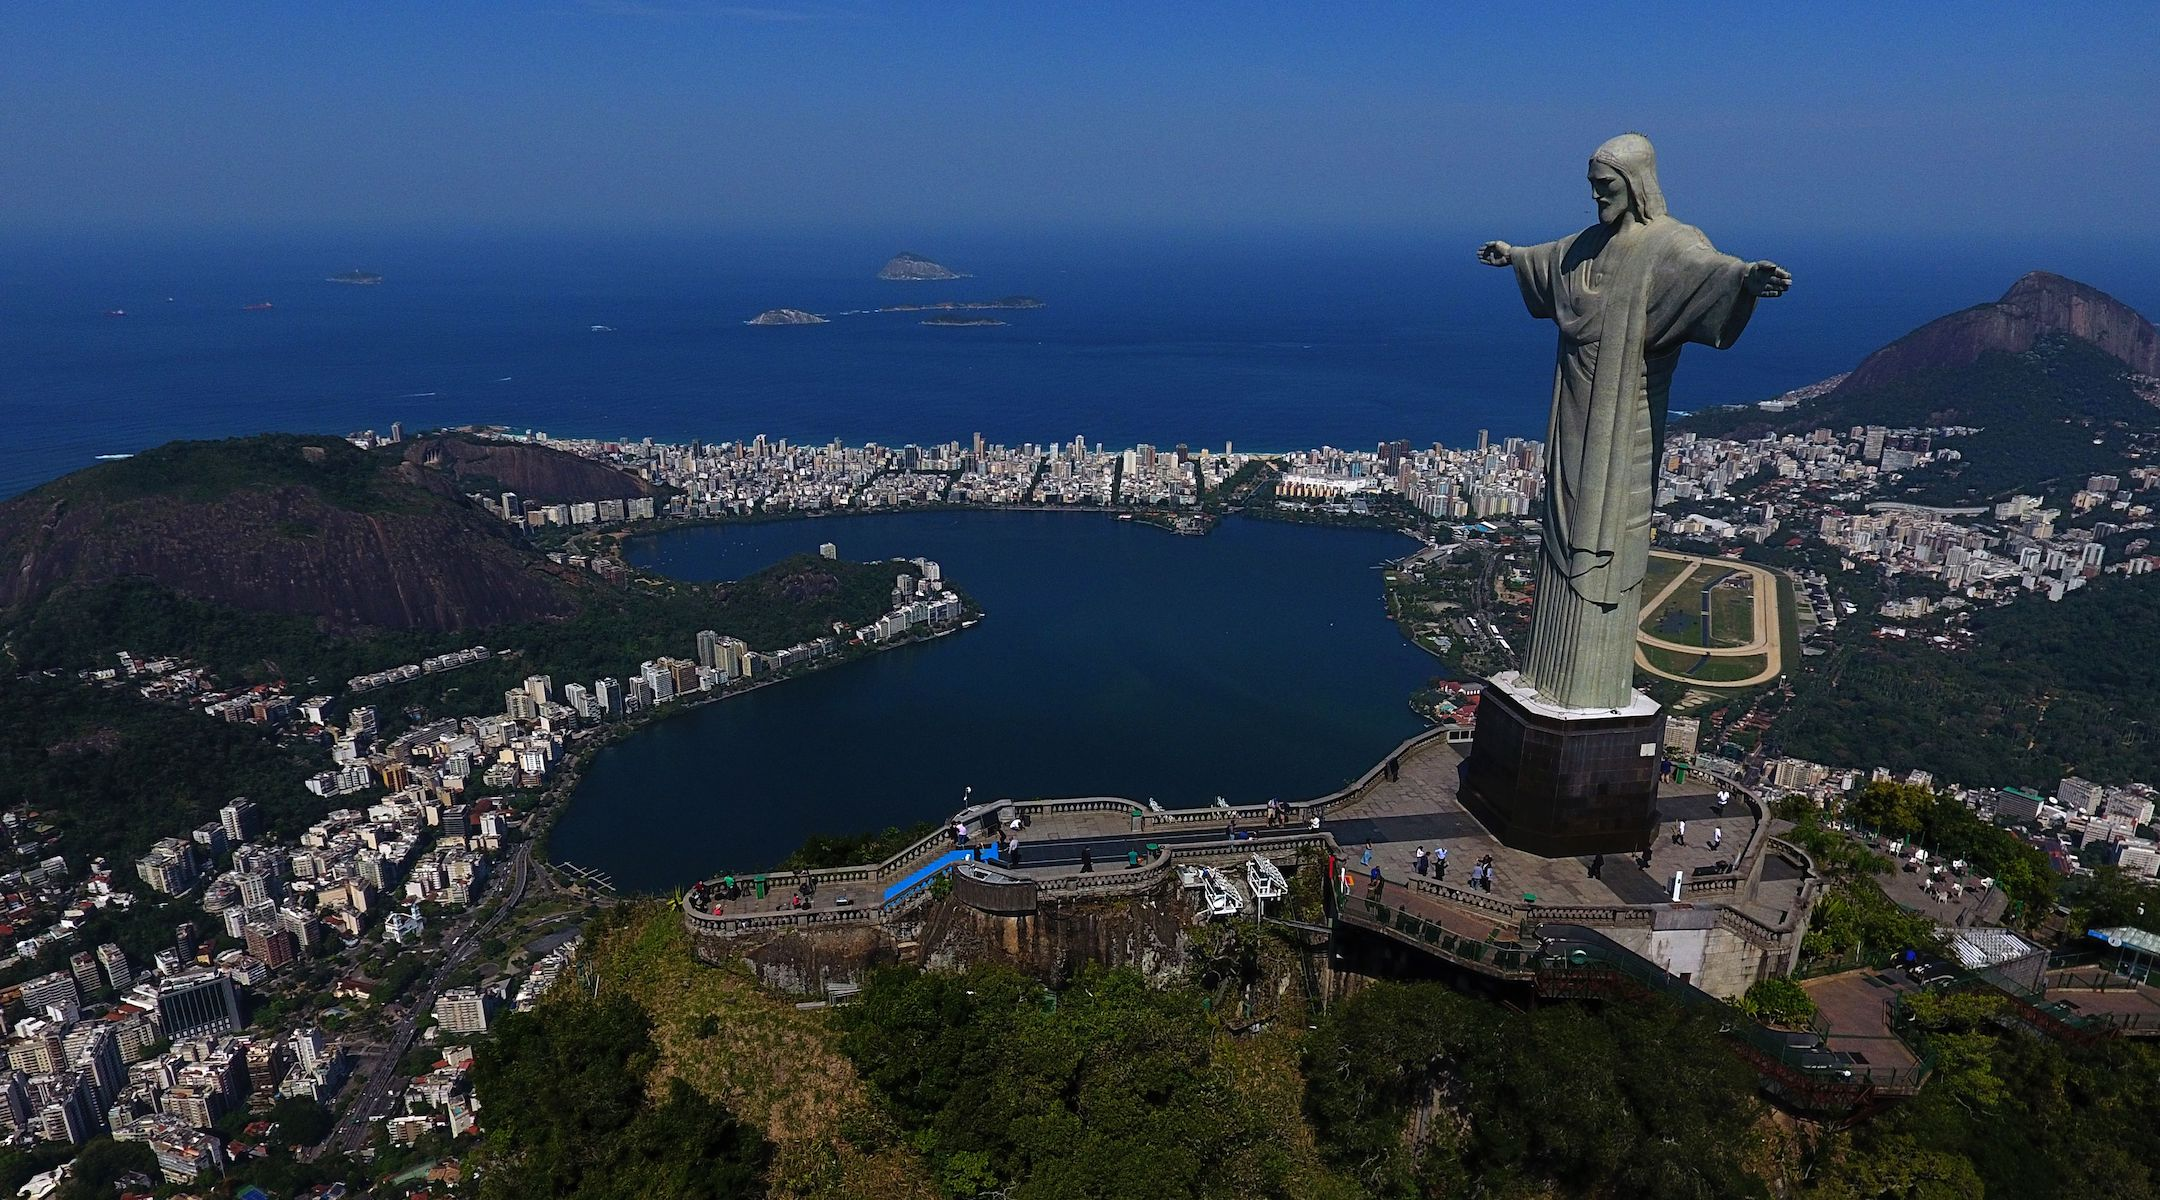 Rio de Janeiro designated sister city of Raanana, Israel`s Brazilian capital